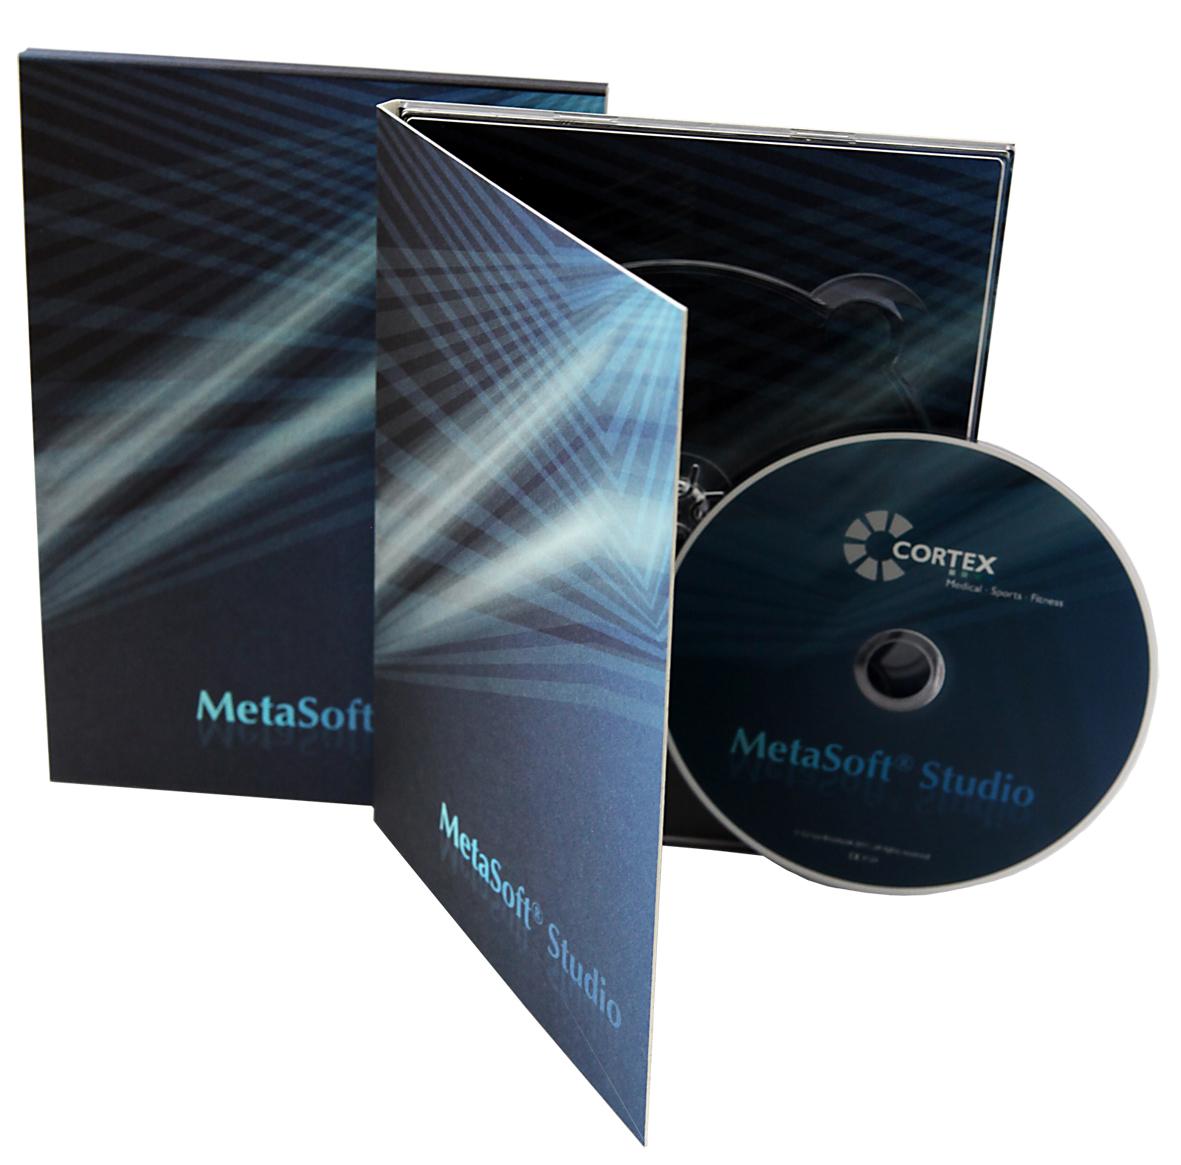 Cortex software Metasoft